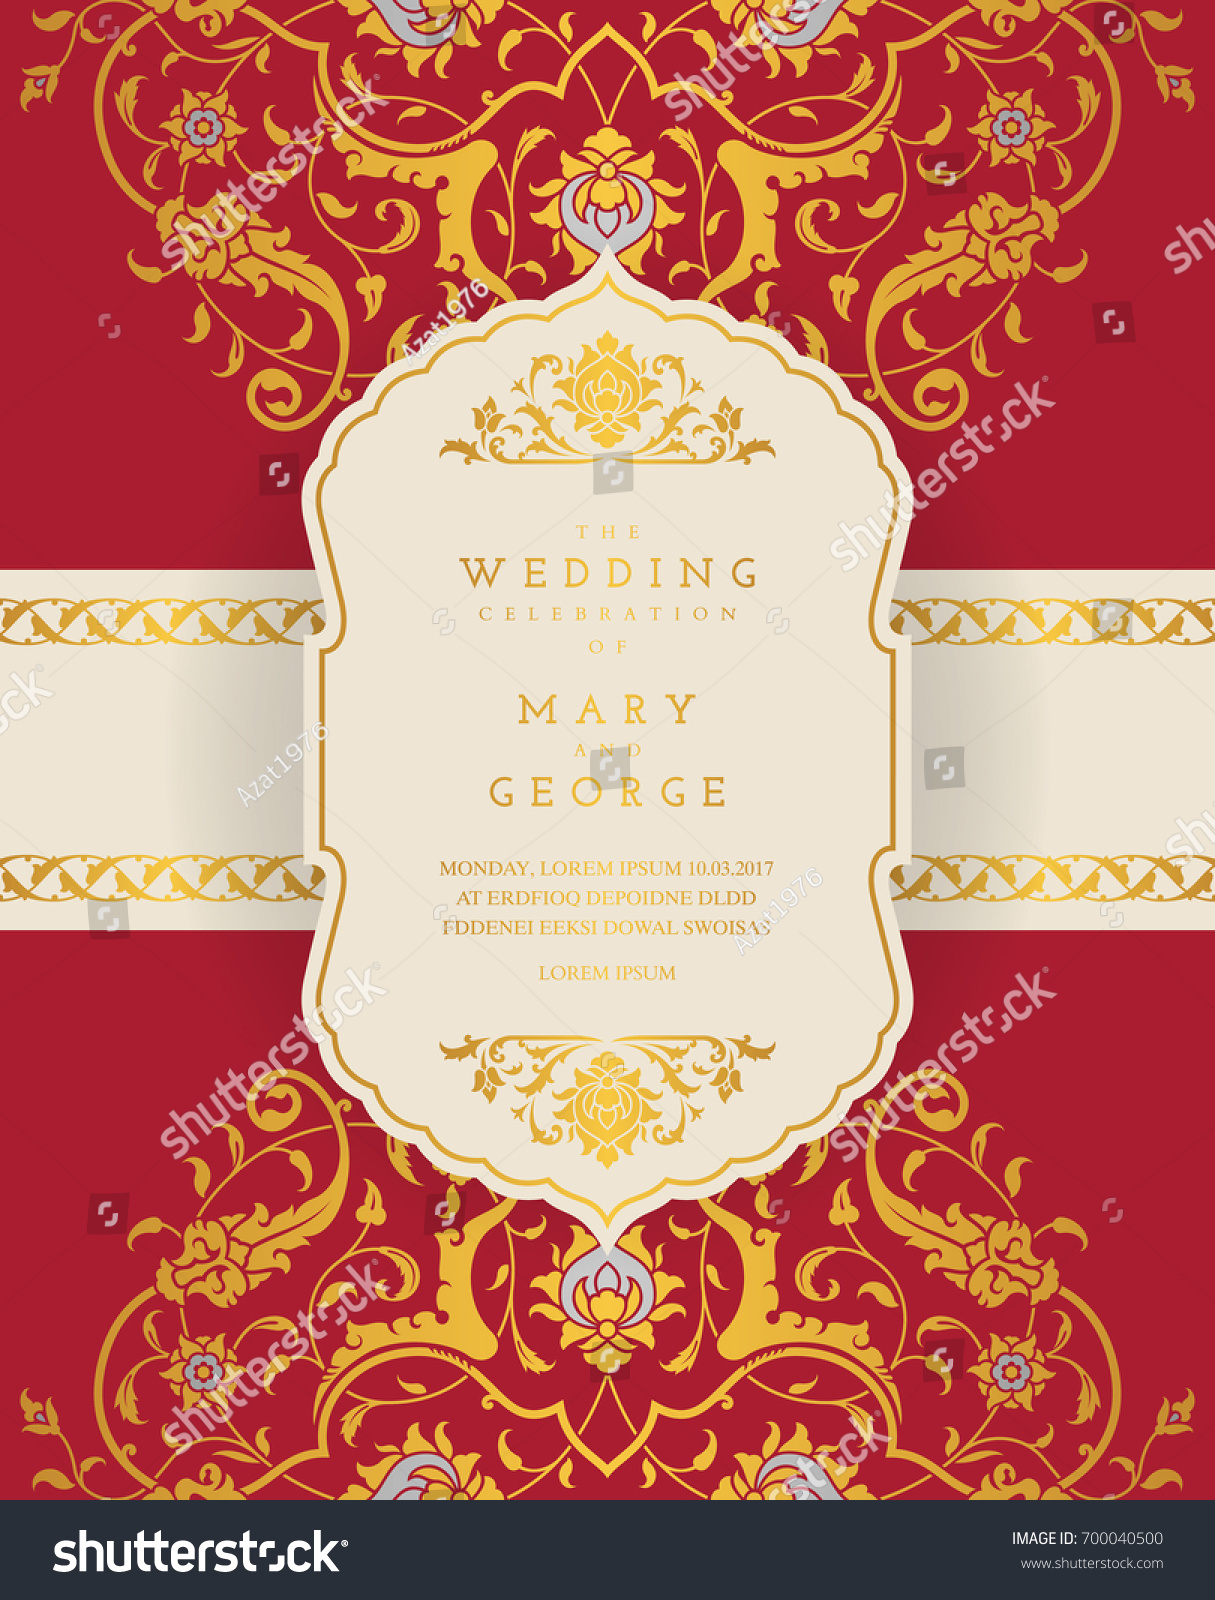 Vintage Wedding Invitation Card Template Floral Stock Vector ...